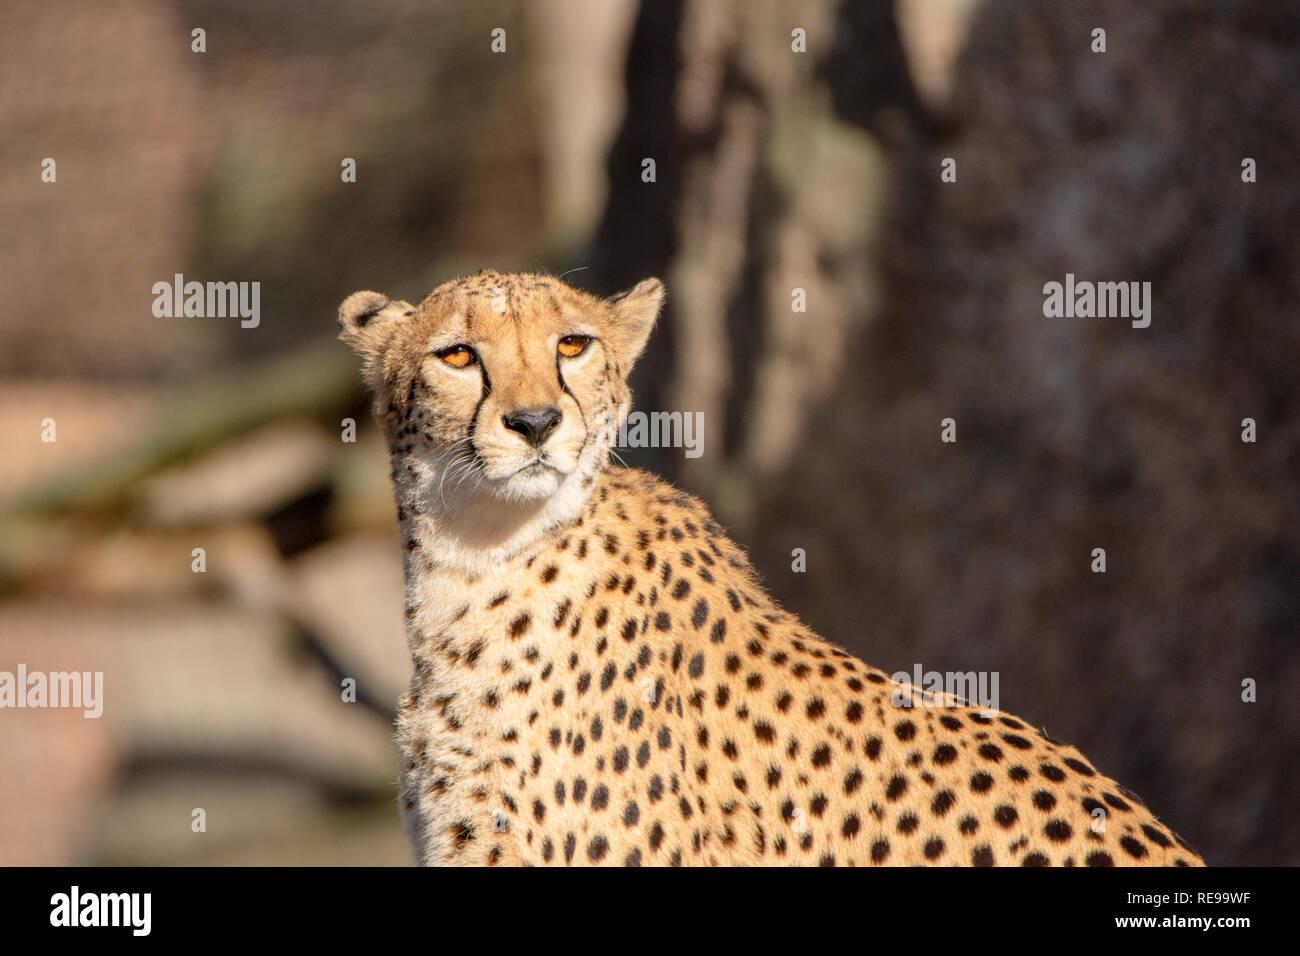 Cheetah in the wild nature Stock Photo